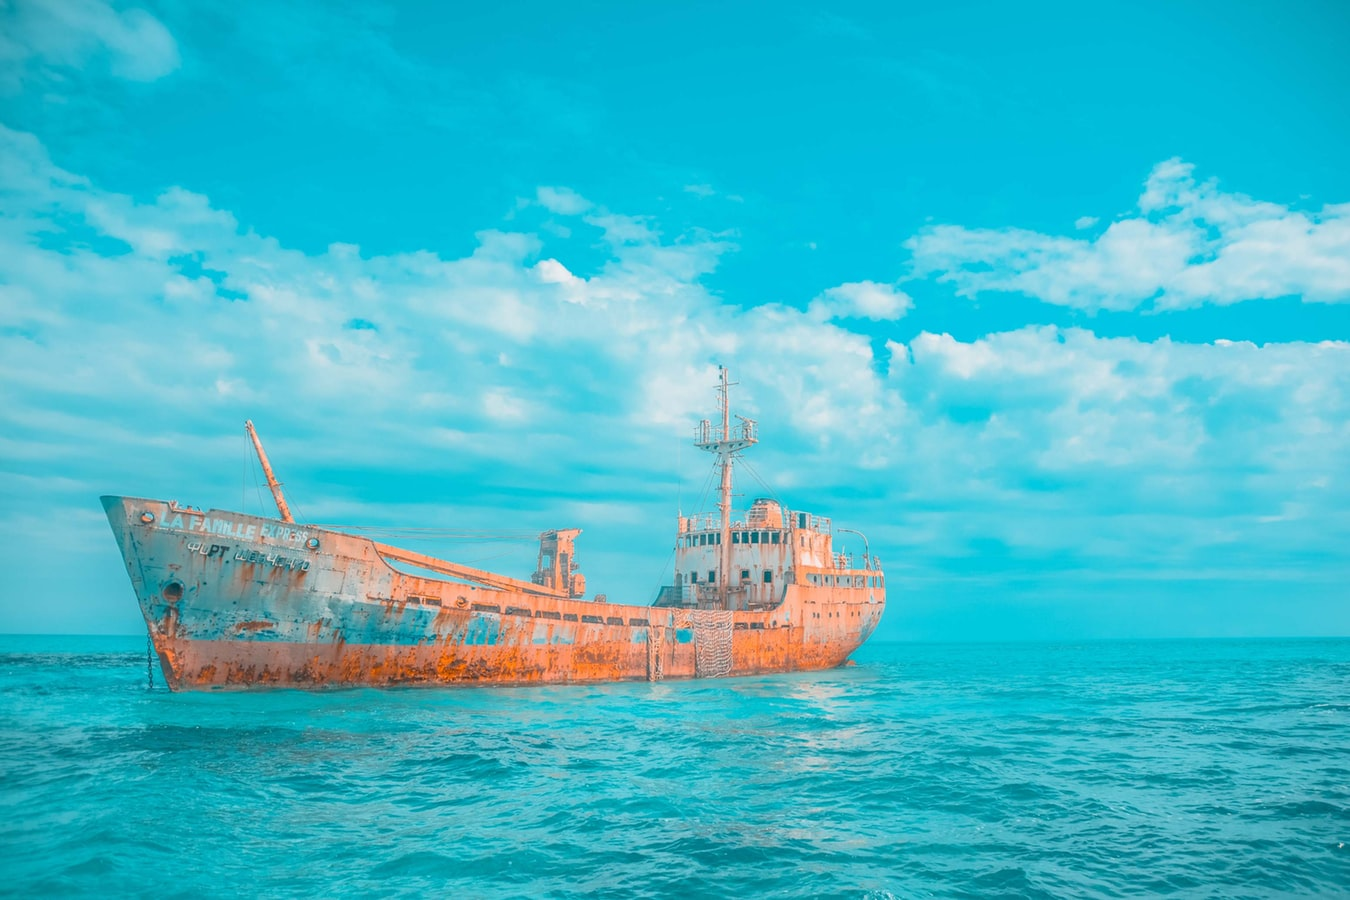 Turks and Caicos shipwreck.jpeg